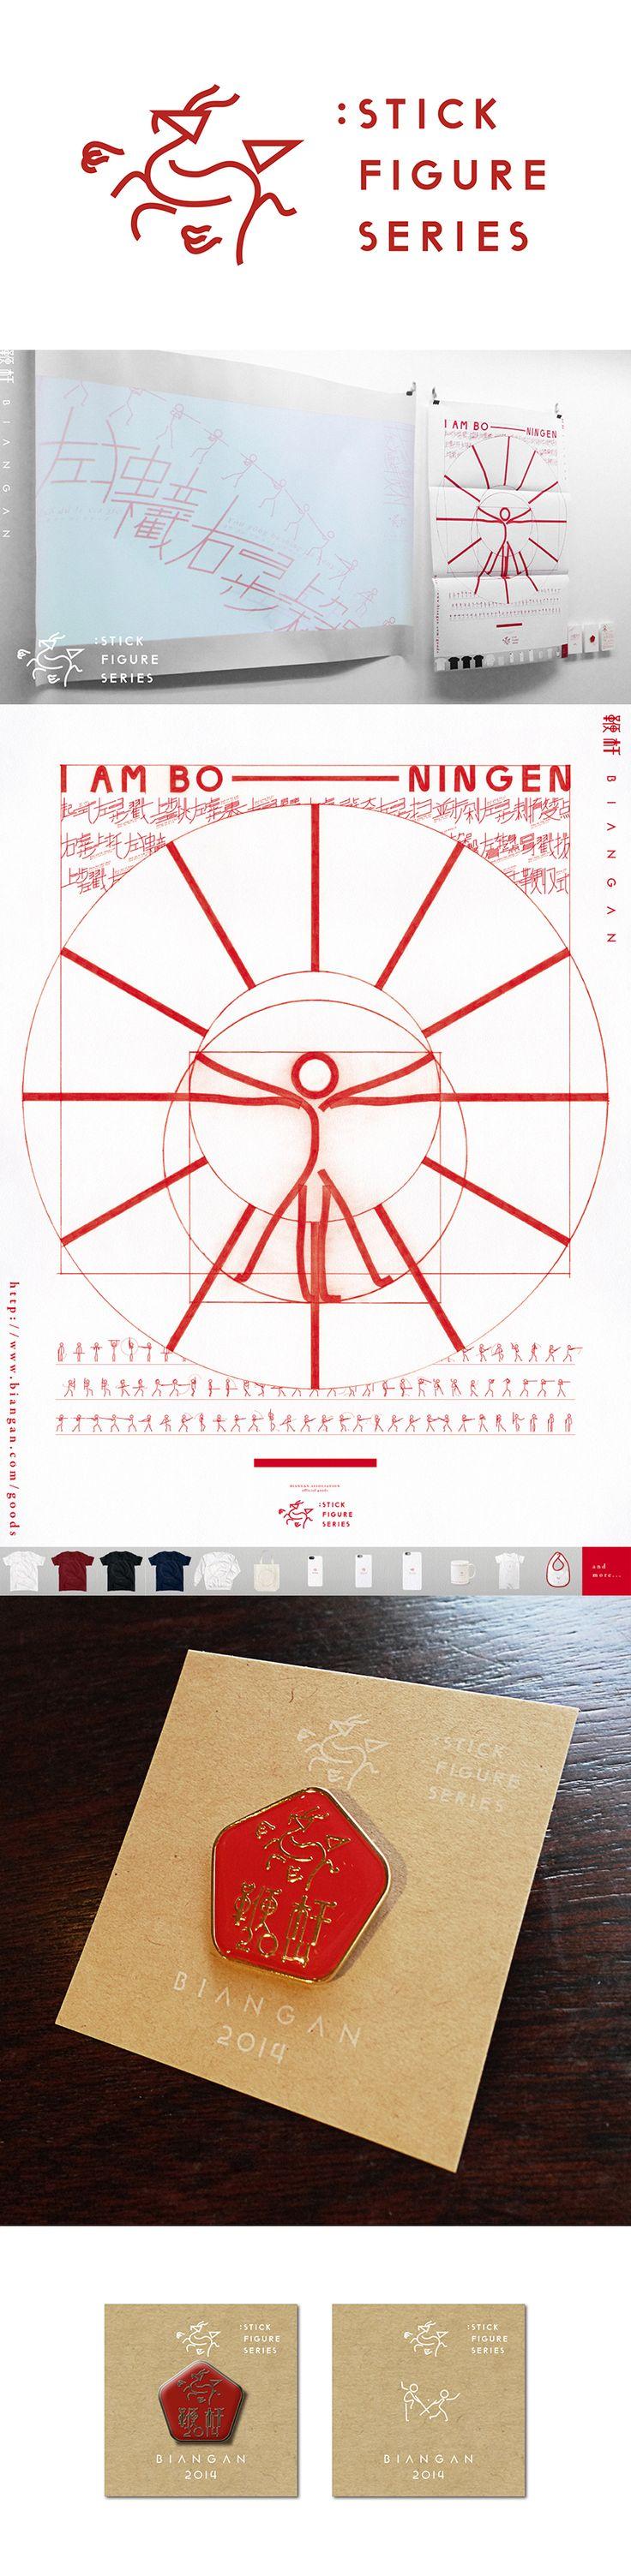 shun_yonemura bianganSFS logo&poster&pins